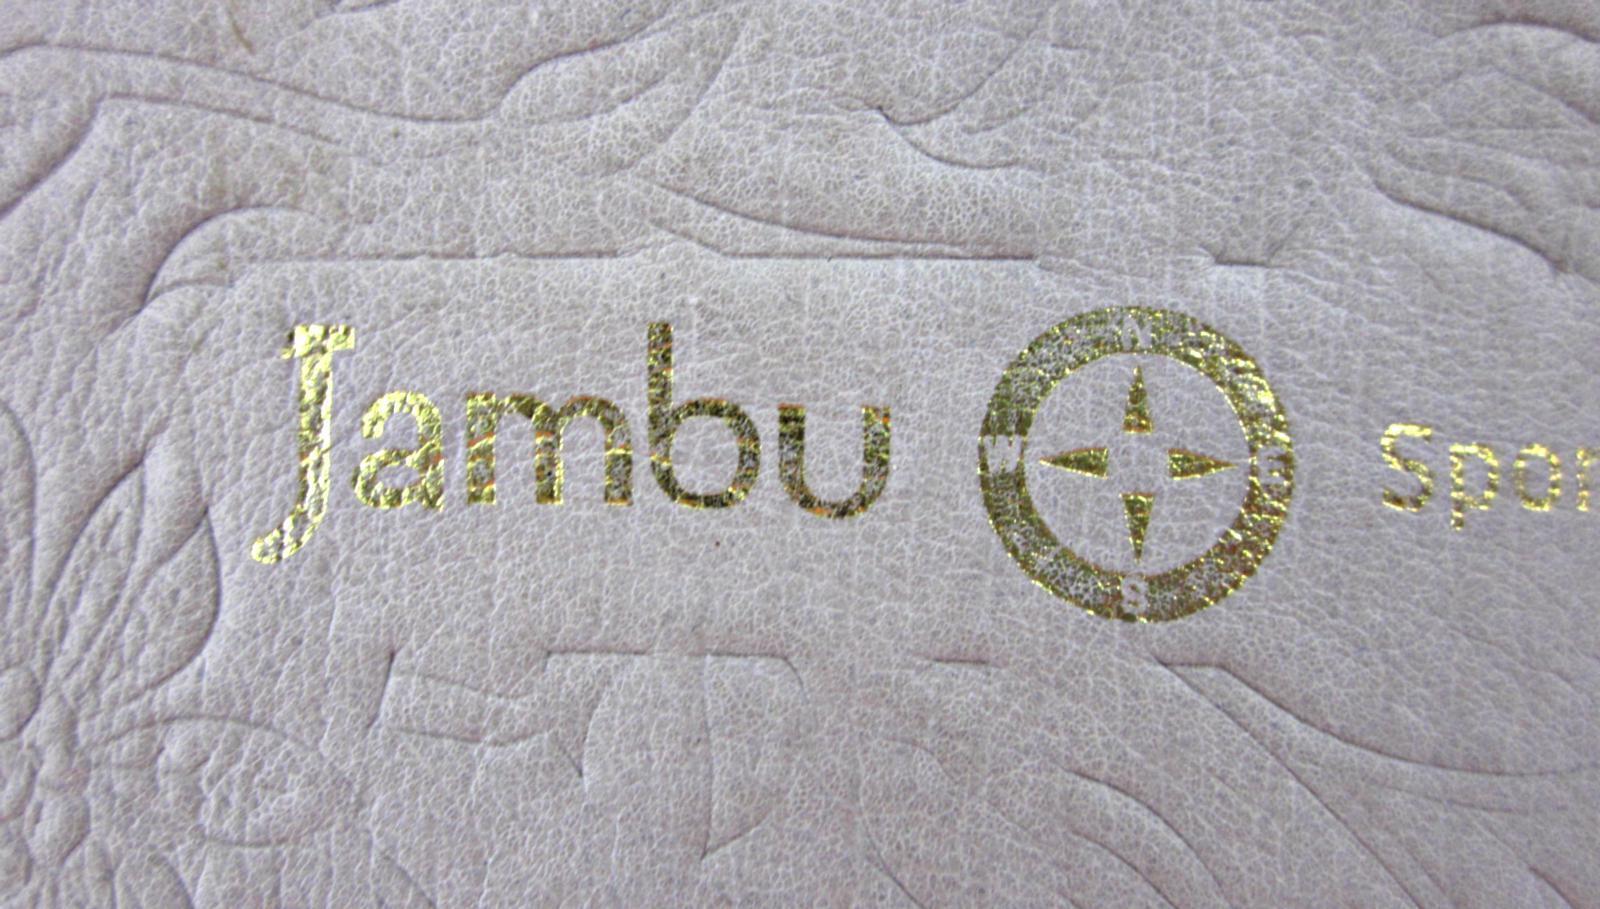 Jambu Leder 'Acapulco' T-Strap Woven Leder Jambu Sandales Platinum Nude 9M Worn Once 0178e4